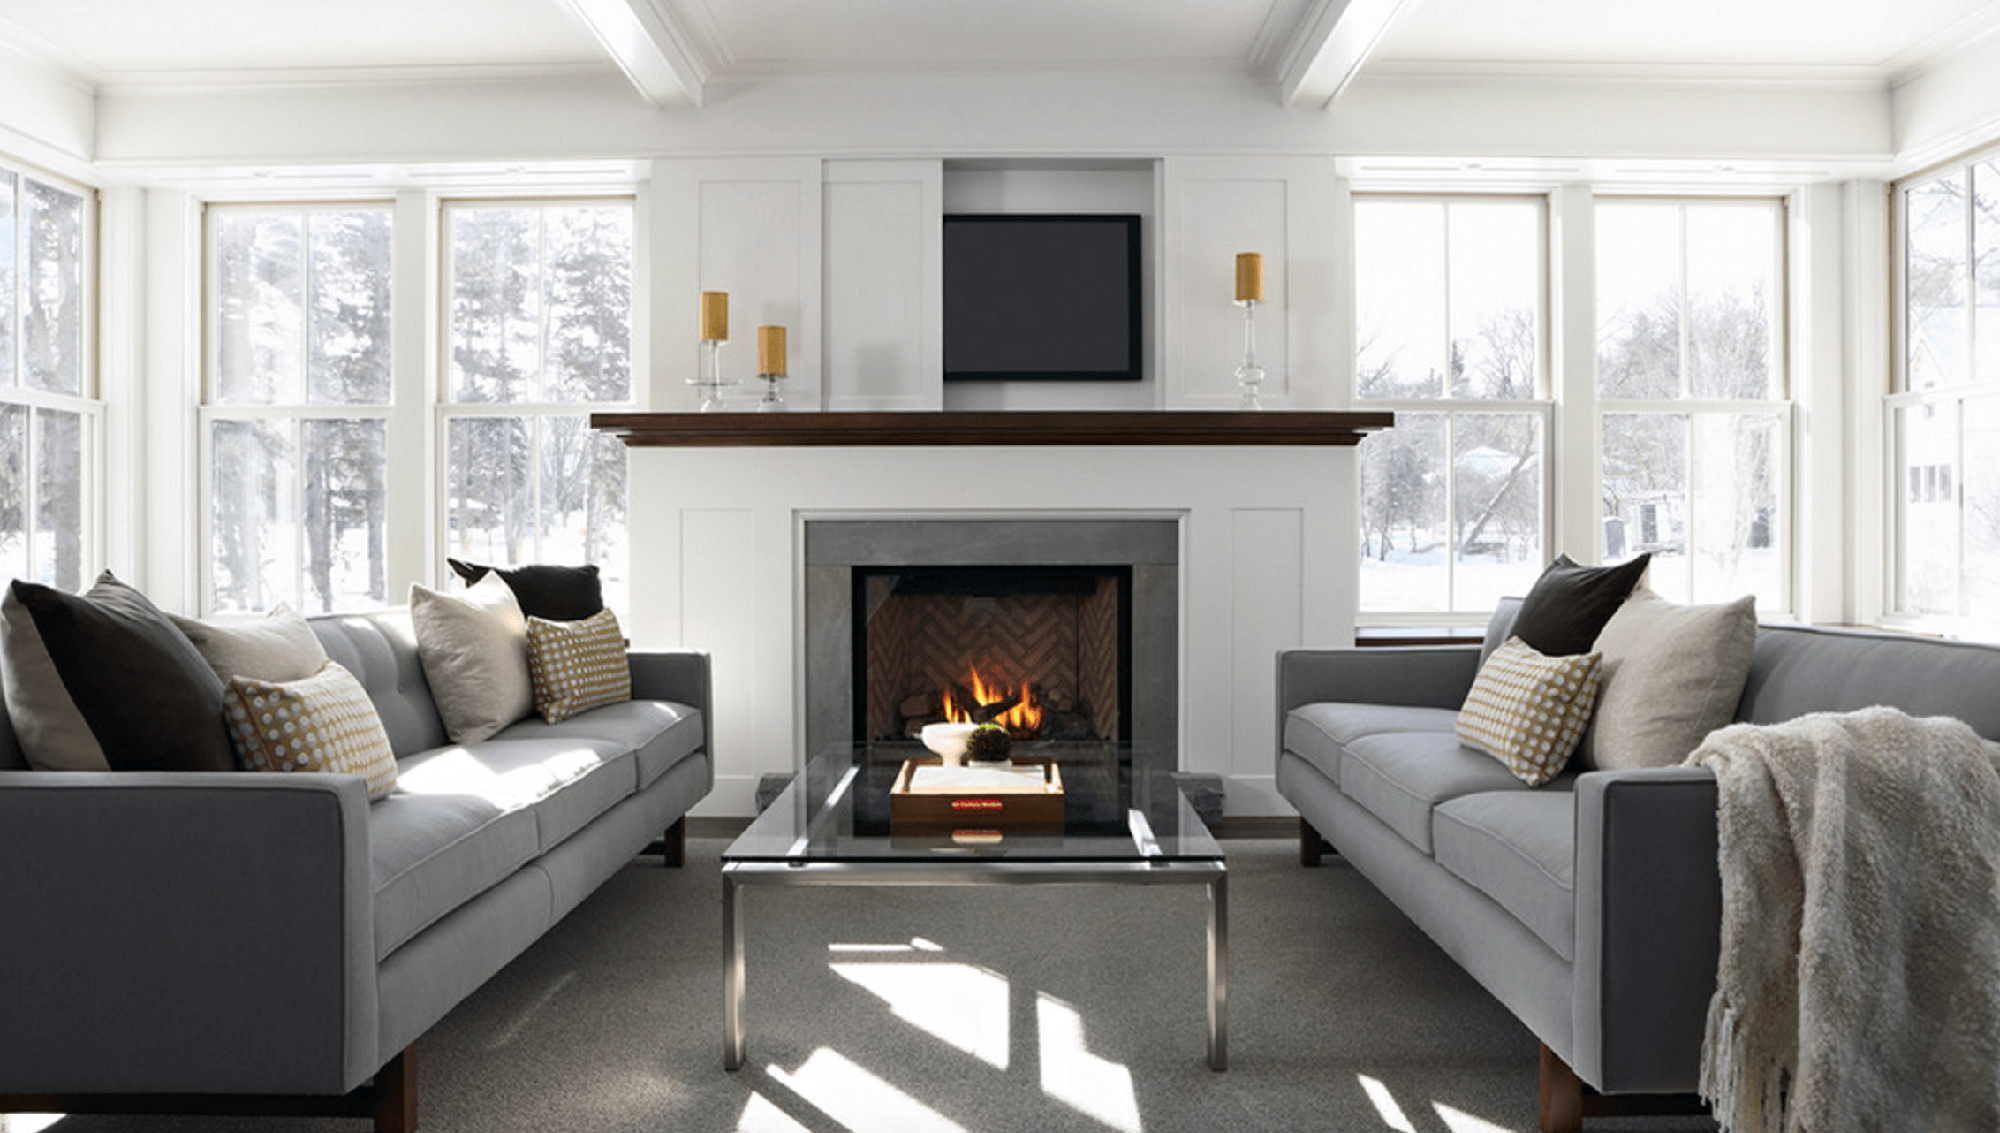 Top Local Long Branch NJ Sunroom Builder beutiful modern sunroom design - Gambrick